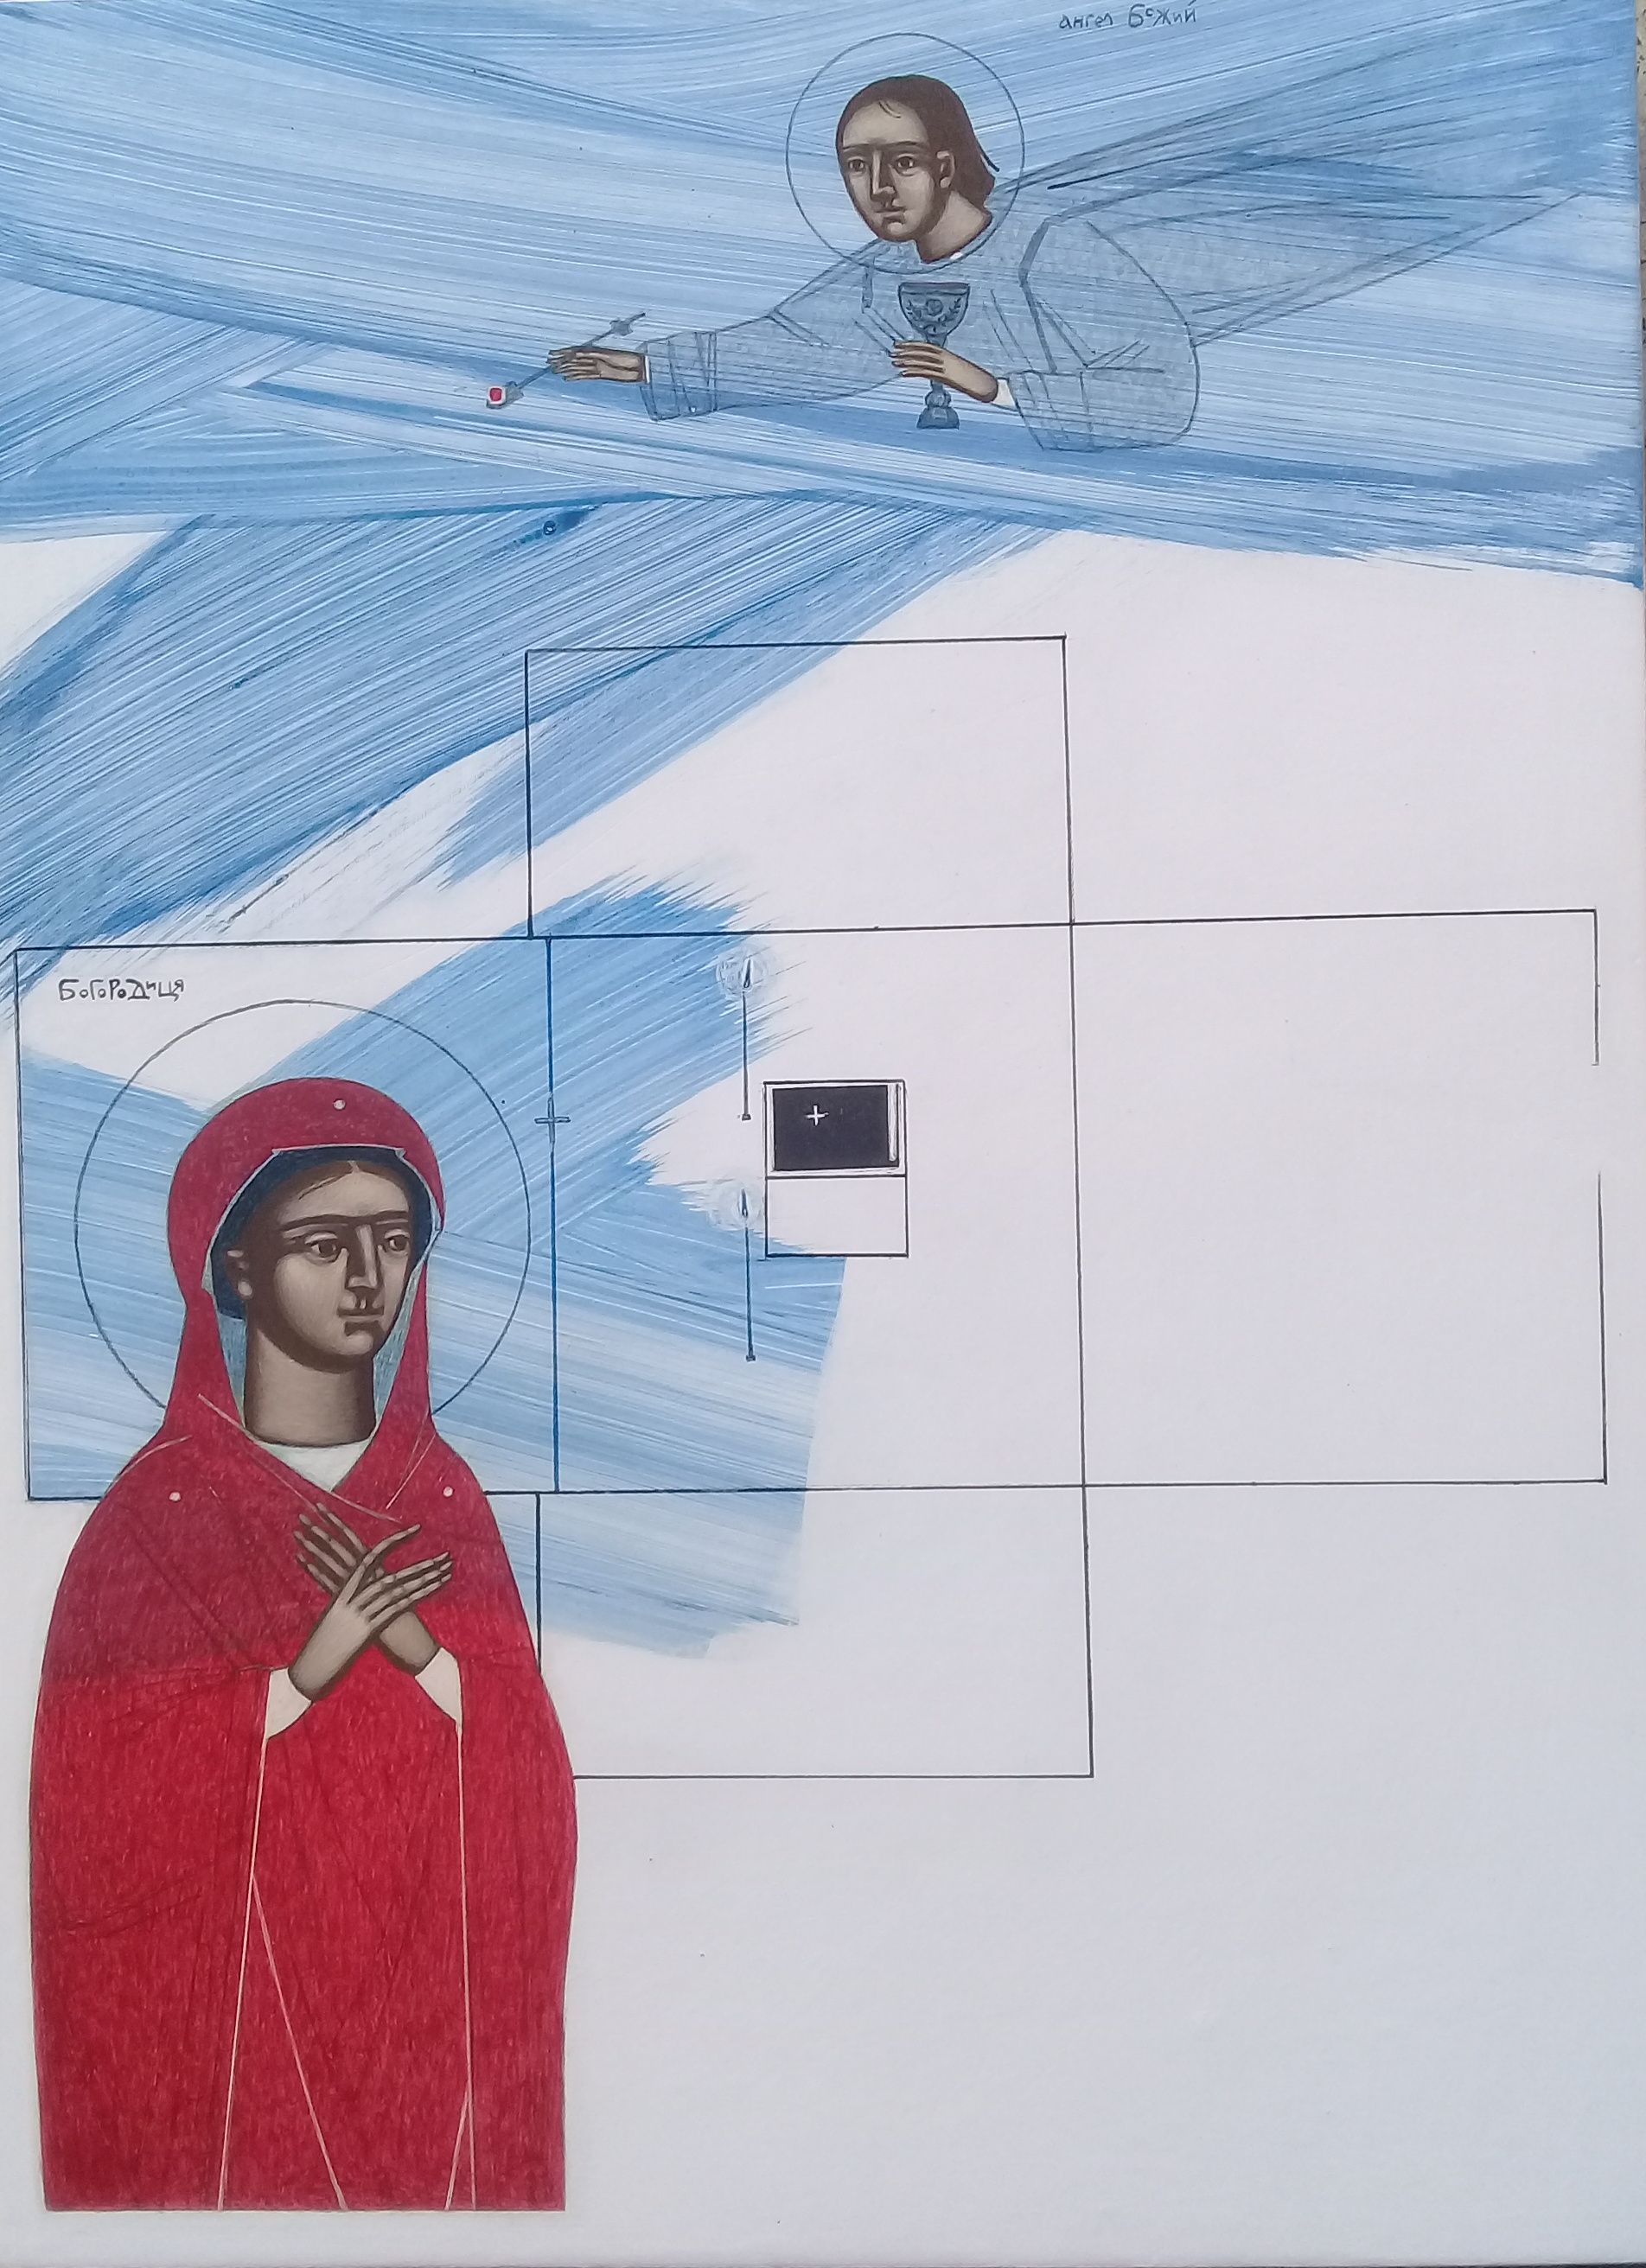 Катерина Кузів. Кивот Святий, 2020; дошка, левкас, жовткова темпера, 40х30